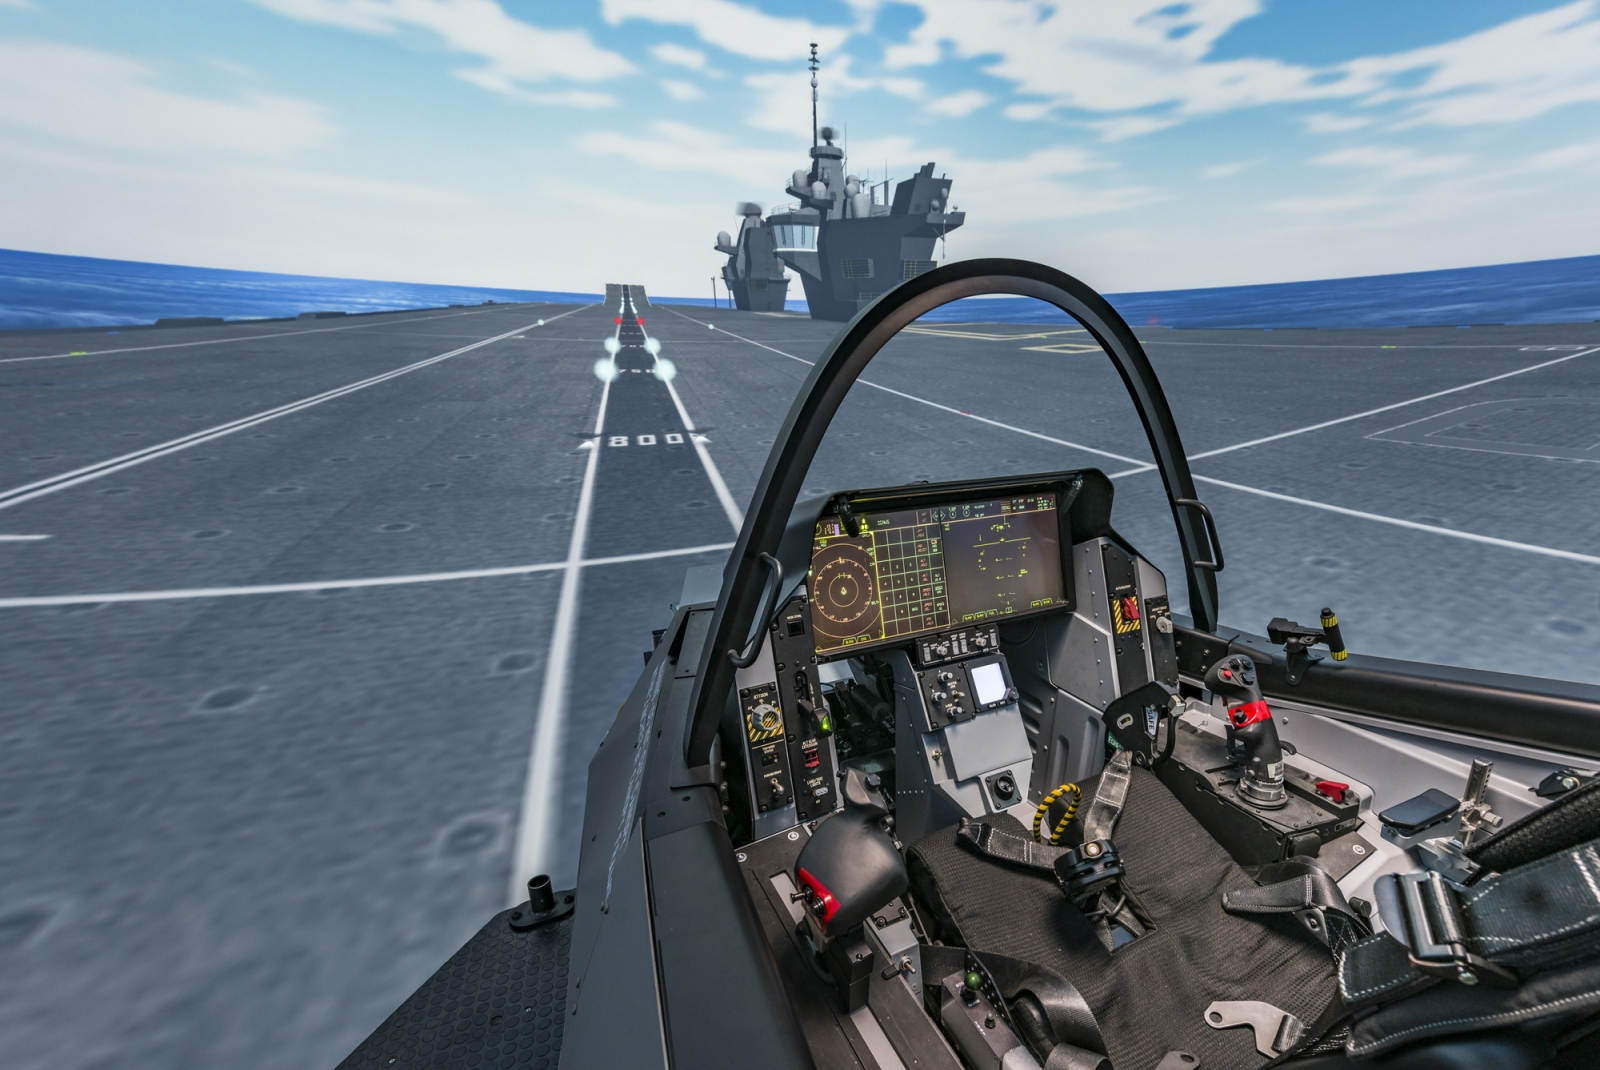 F-35 Lightning II flight simulator BAE Systems